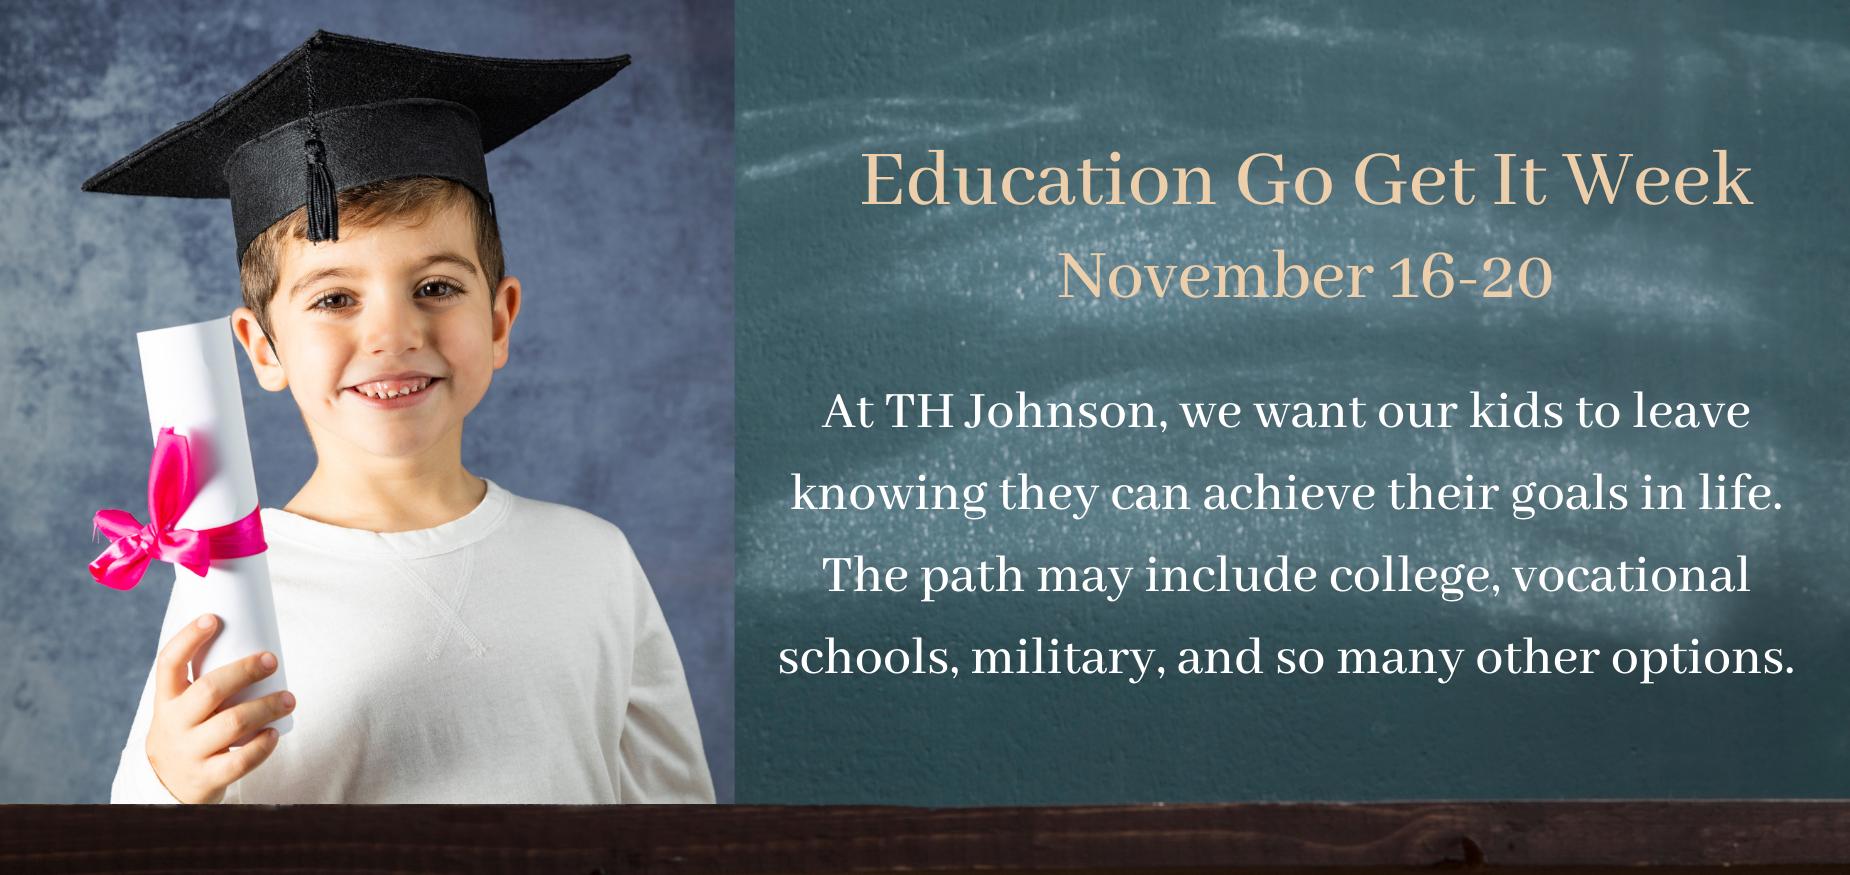 Education Go Get It Week 11/16-11/20